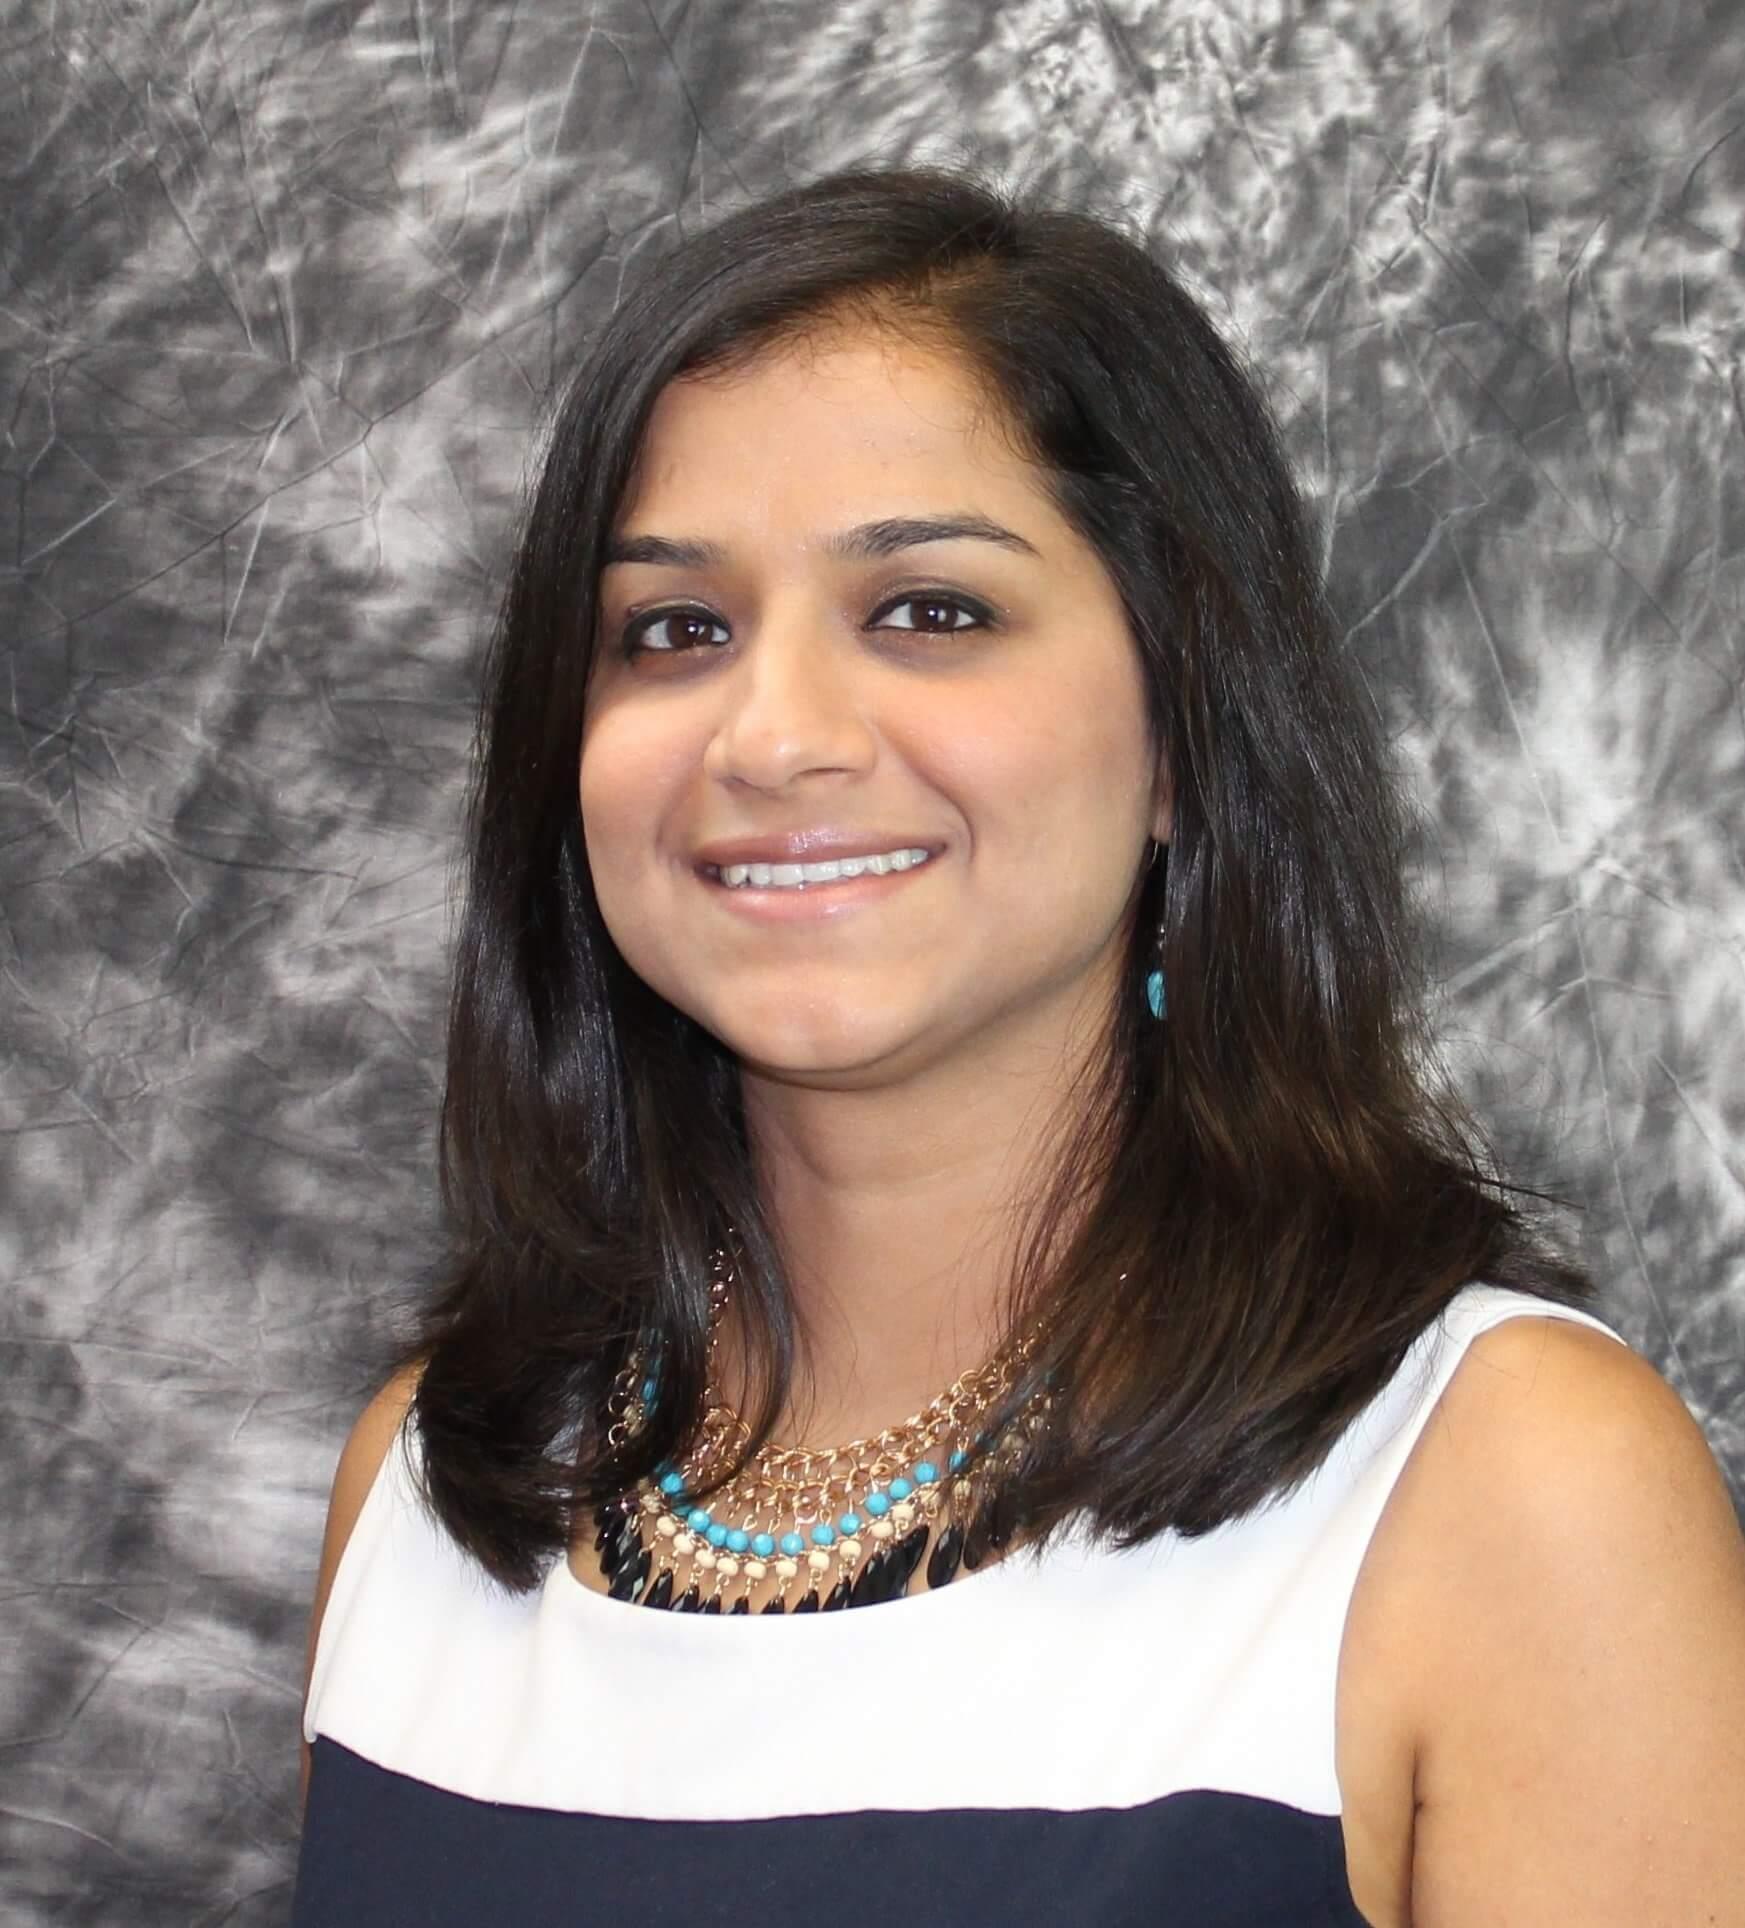 Sapna Kaul, Ph.D., Assistant Professor of Health Economics, Dept. of Preventive Medicine and Community Health